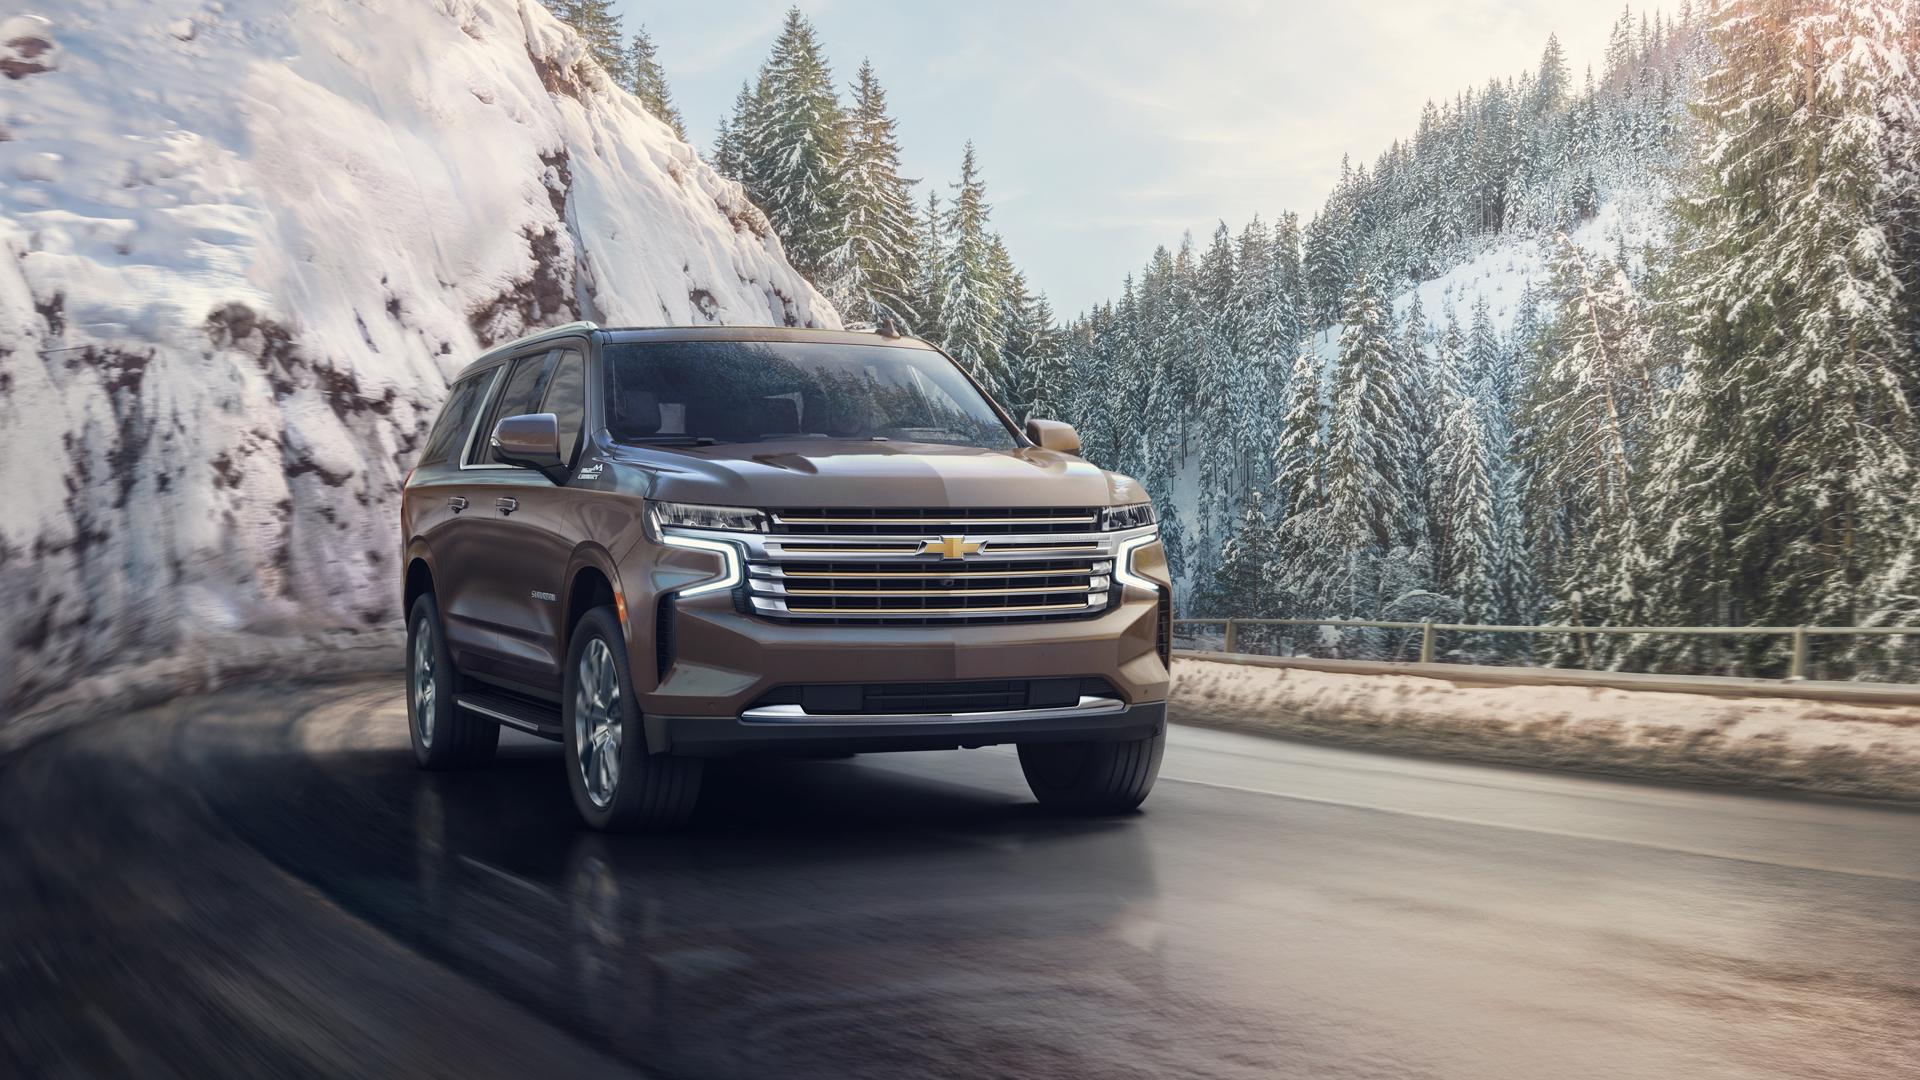 2021 Chevrolet Suburban Revealed   What's new, suspension ...